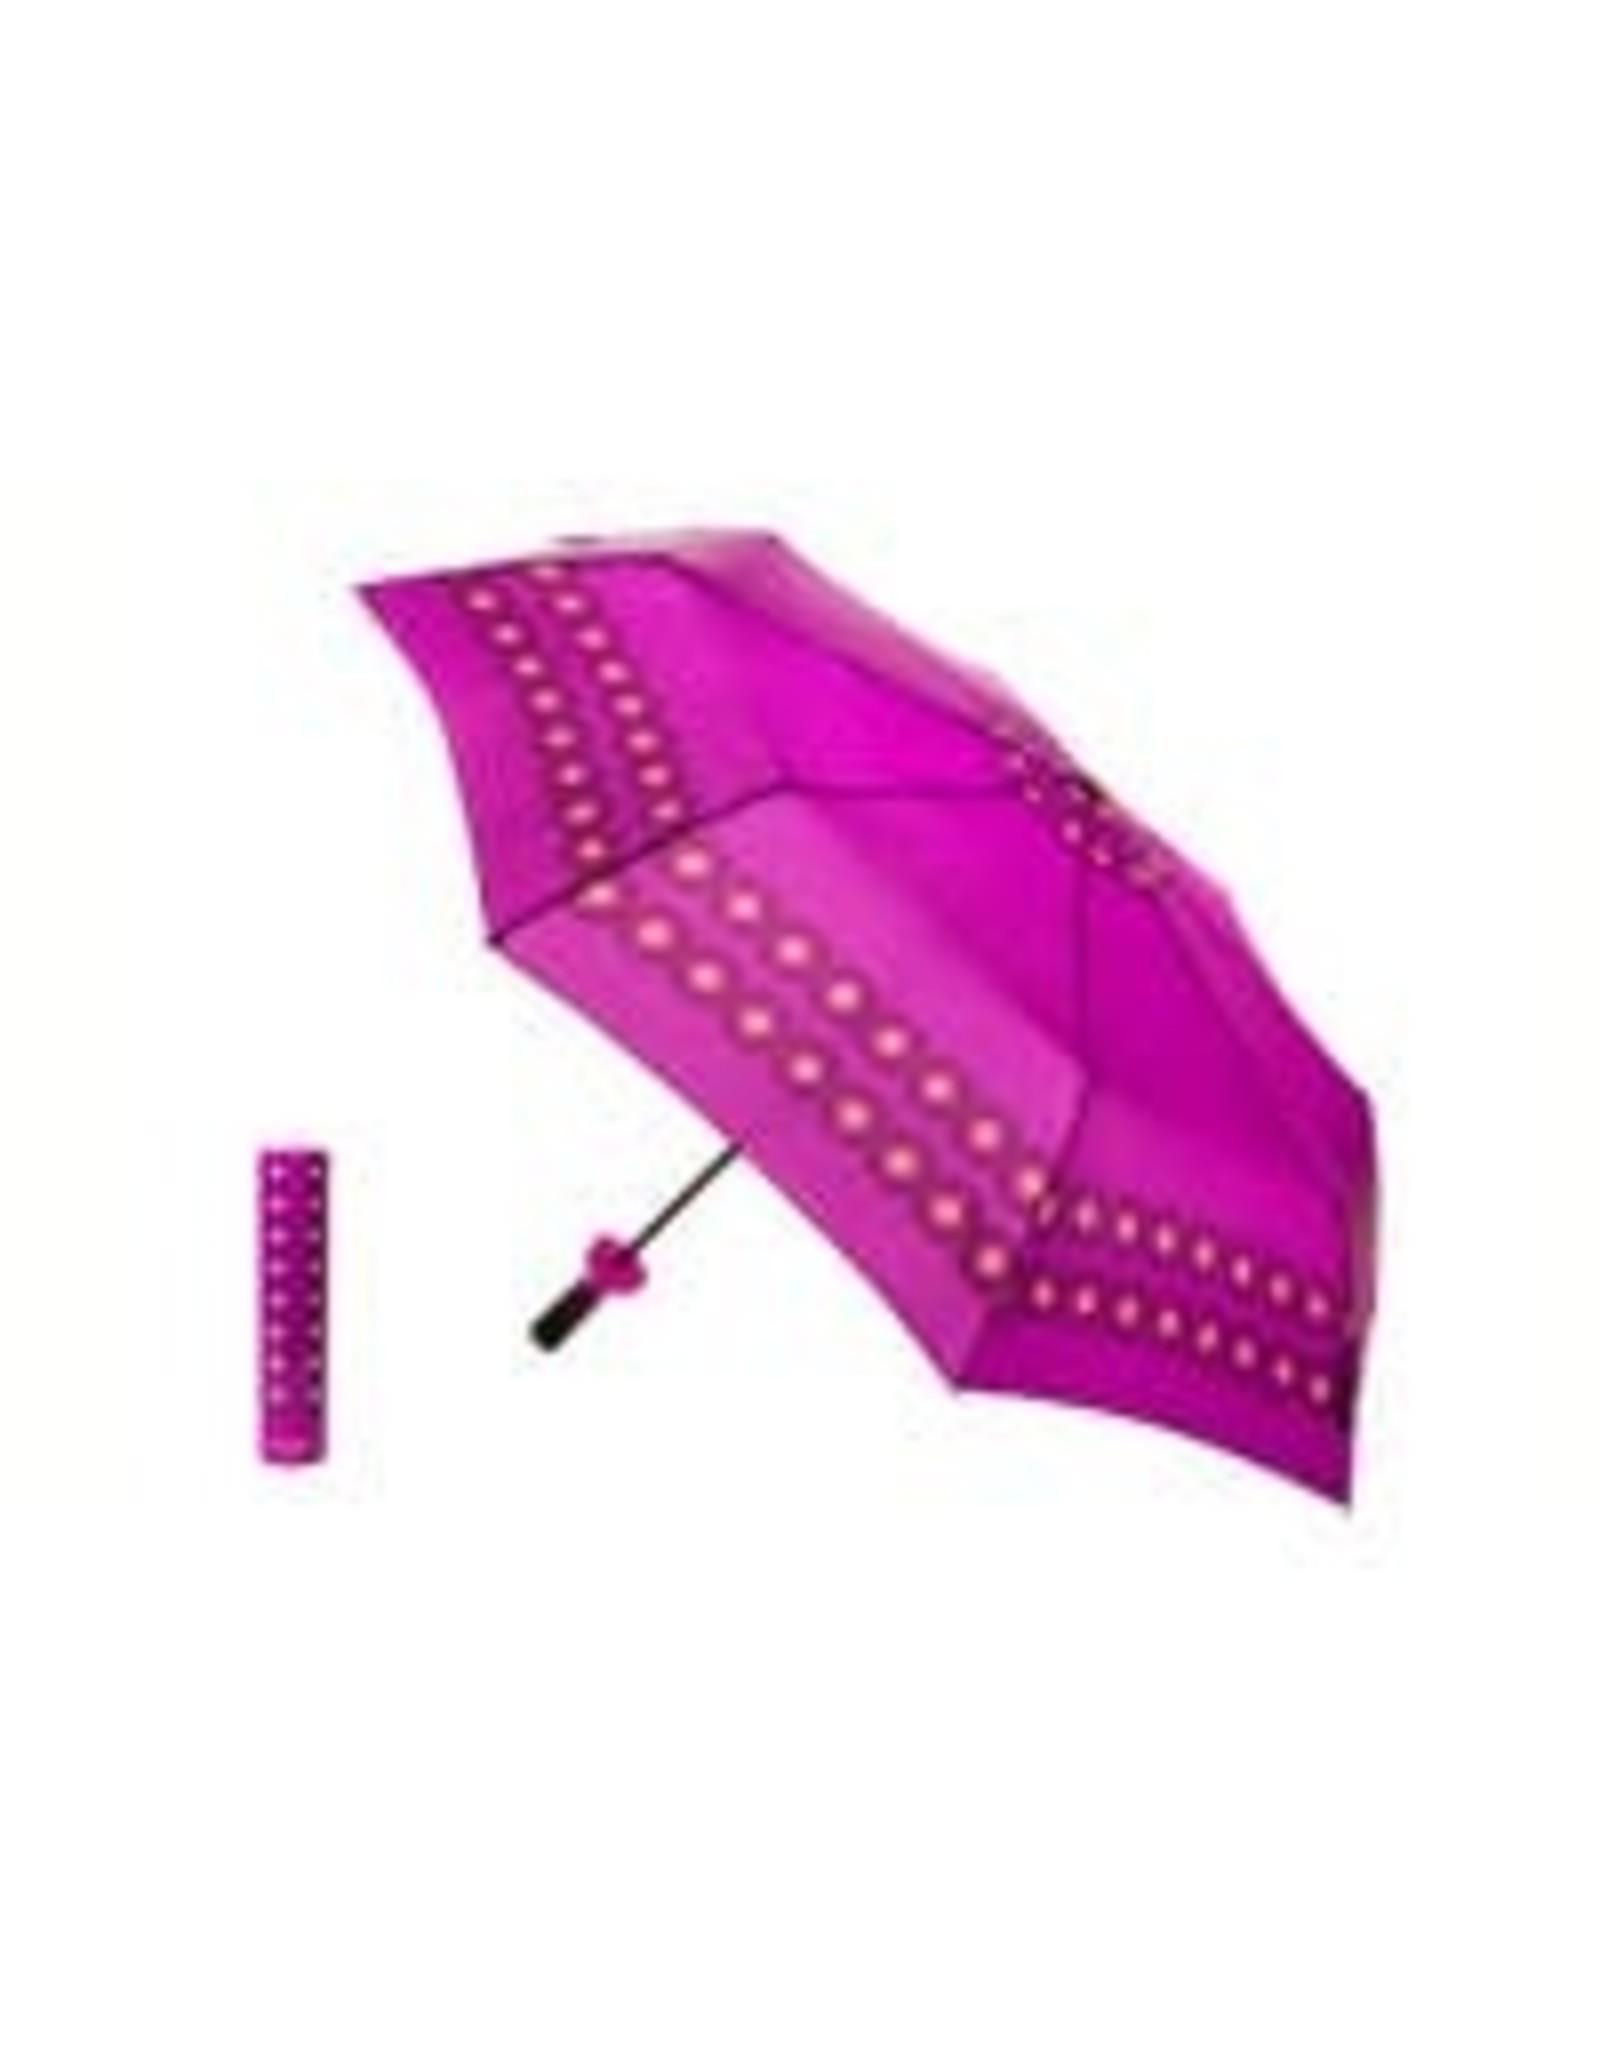 Morning Glory Umbrella